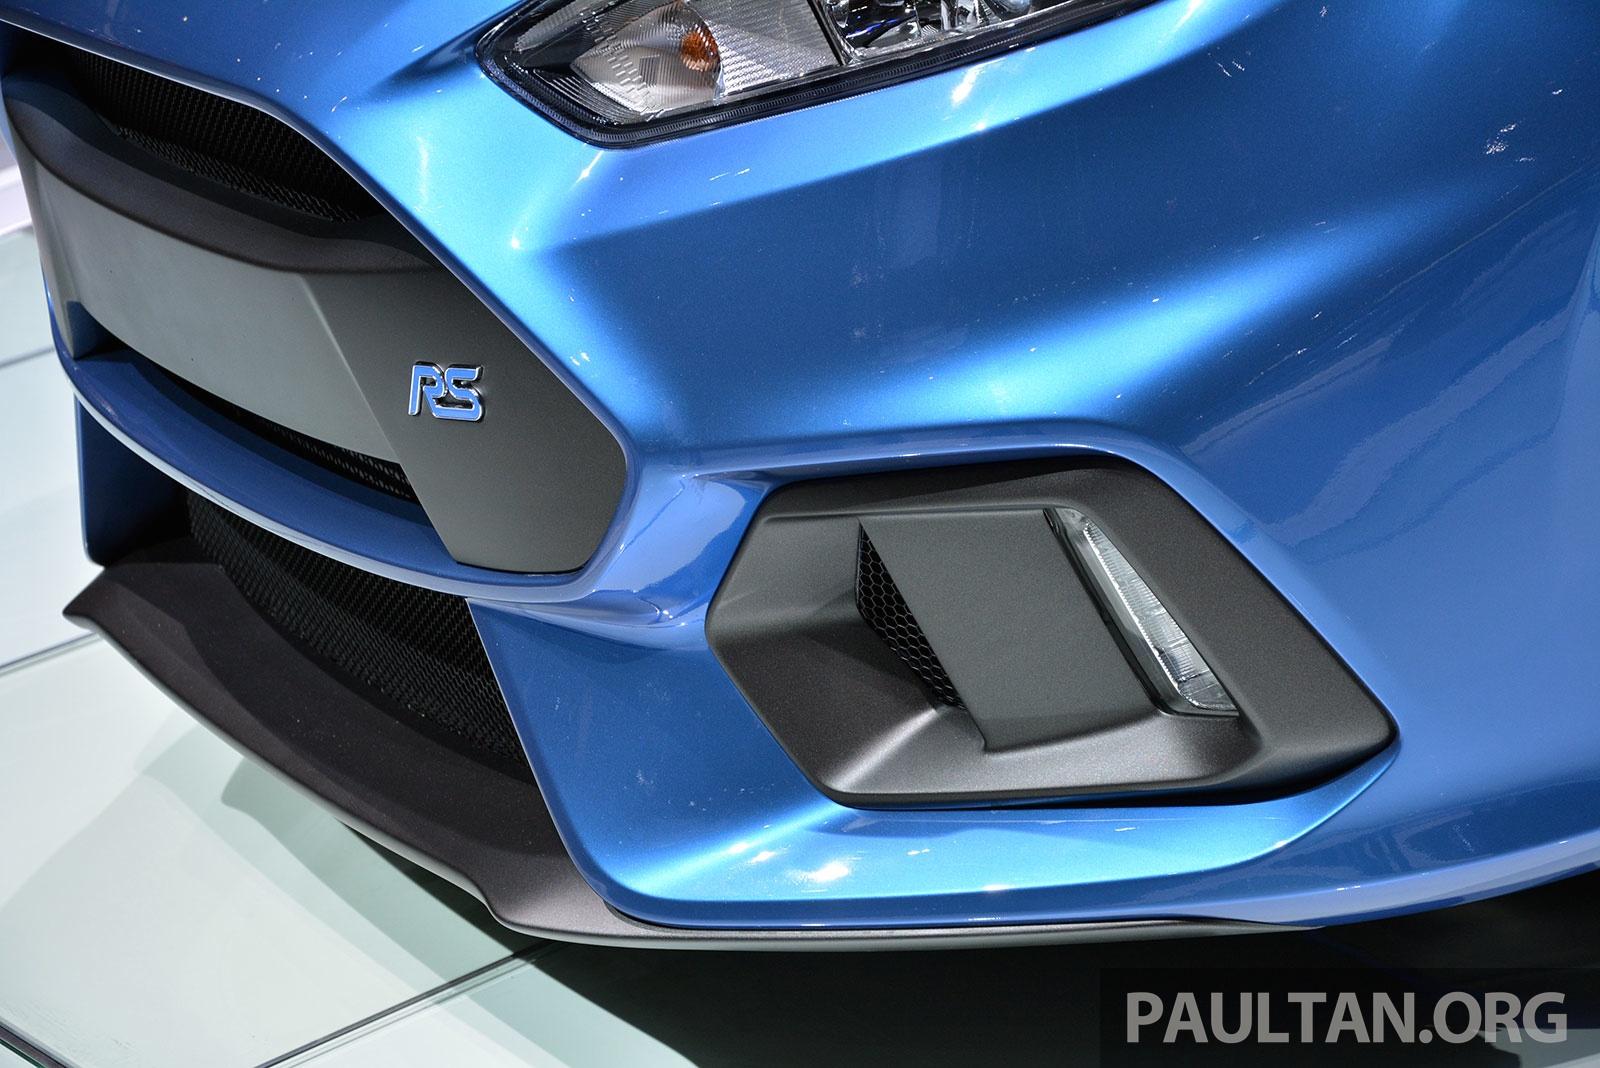 2015 Focus Rs >> GALLERY: Ford Focus RS world premiere at Geneva Paul Tan - Image 316515